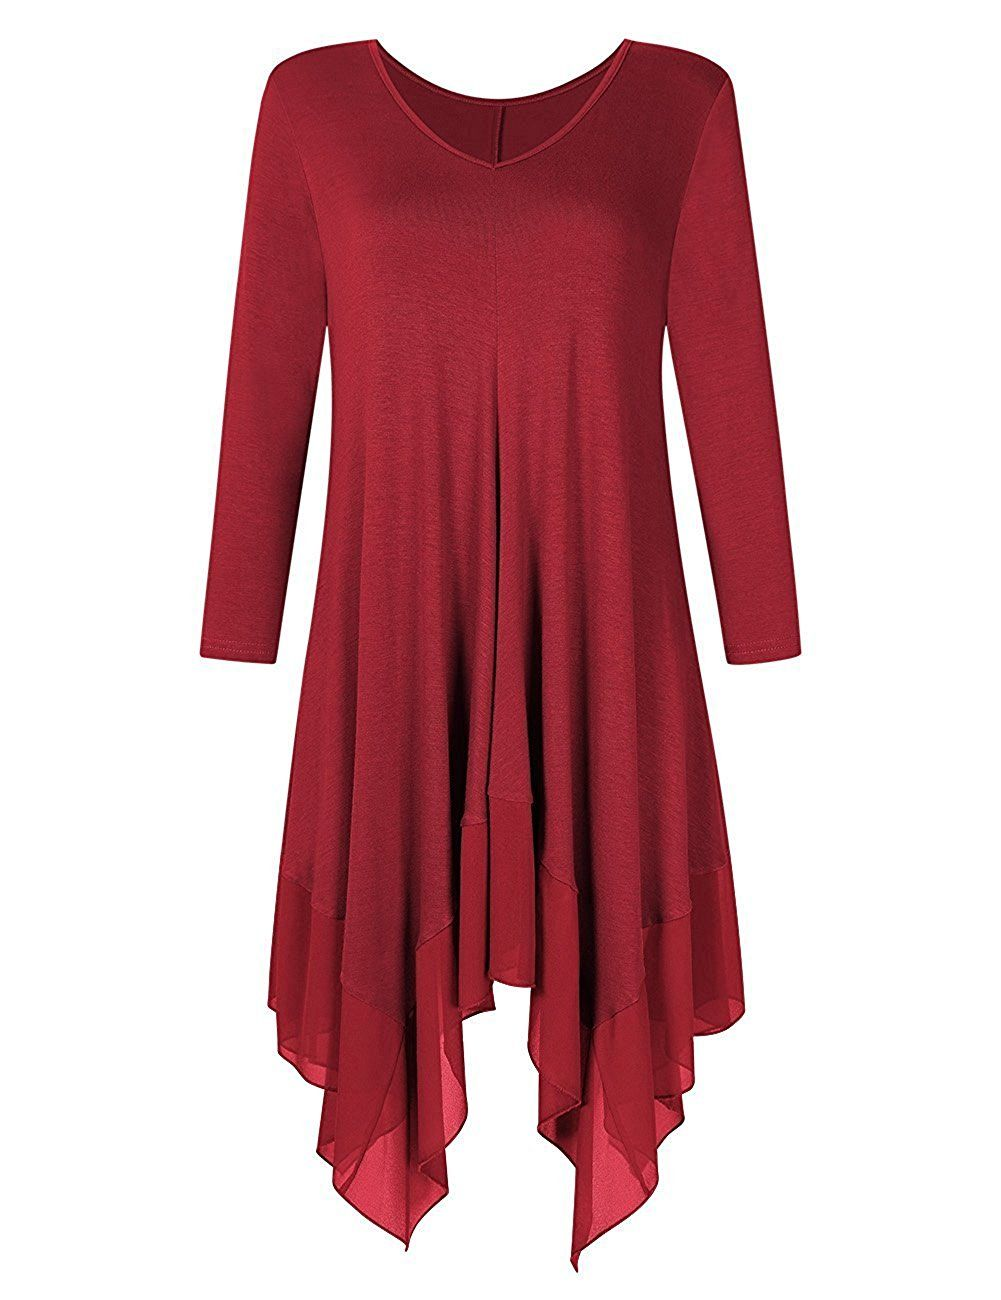 Kinikiss women irregular hem long sleeve loose shirt dress top plus